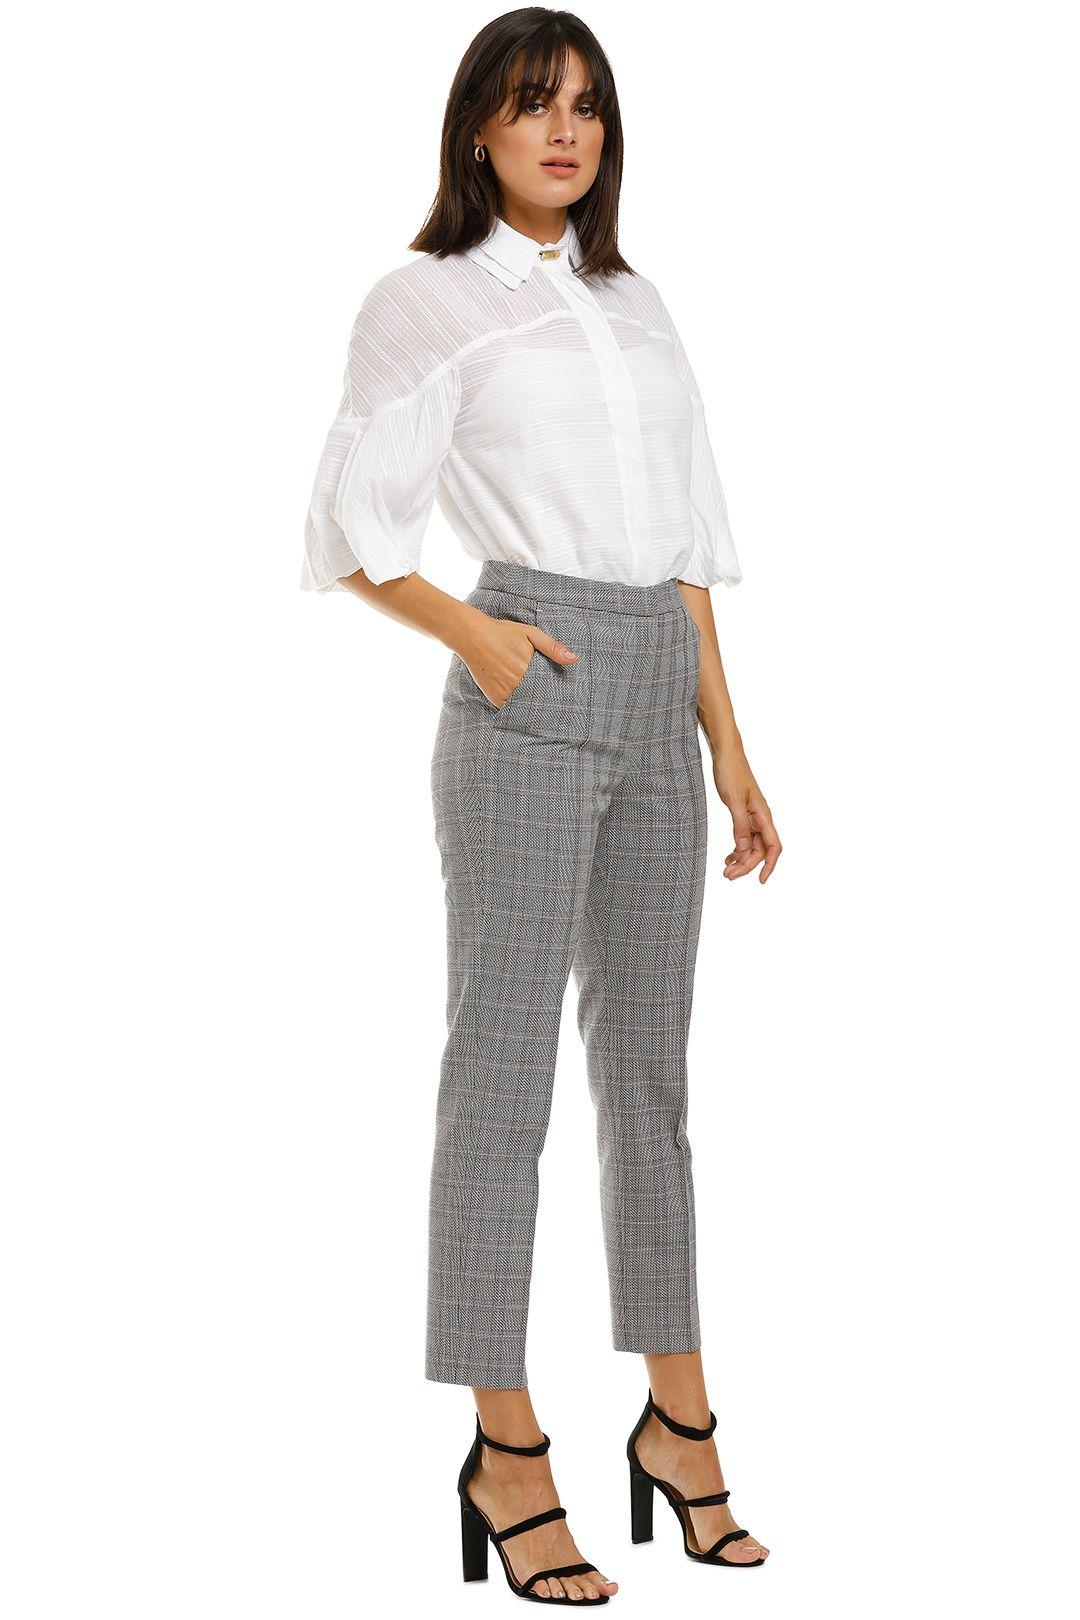 Rebecca-Margot-Slim-Pant-Grey-Check-Side